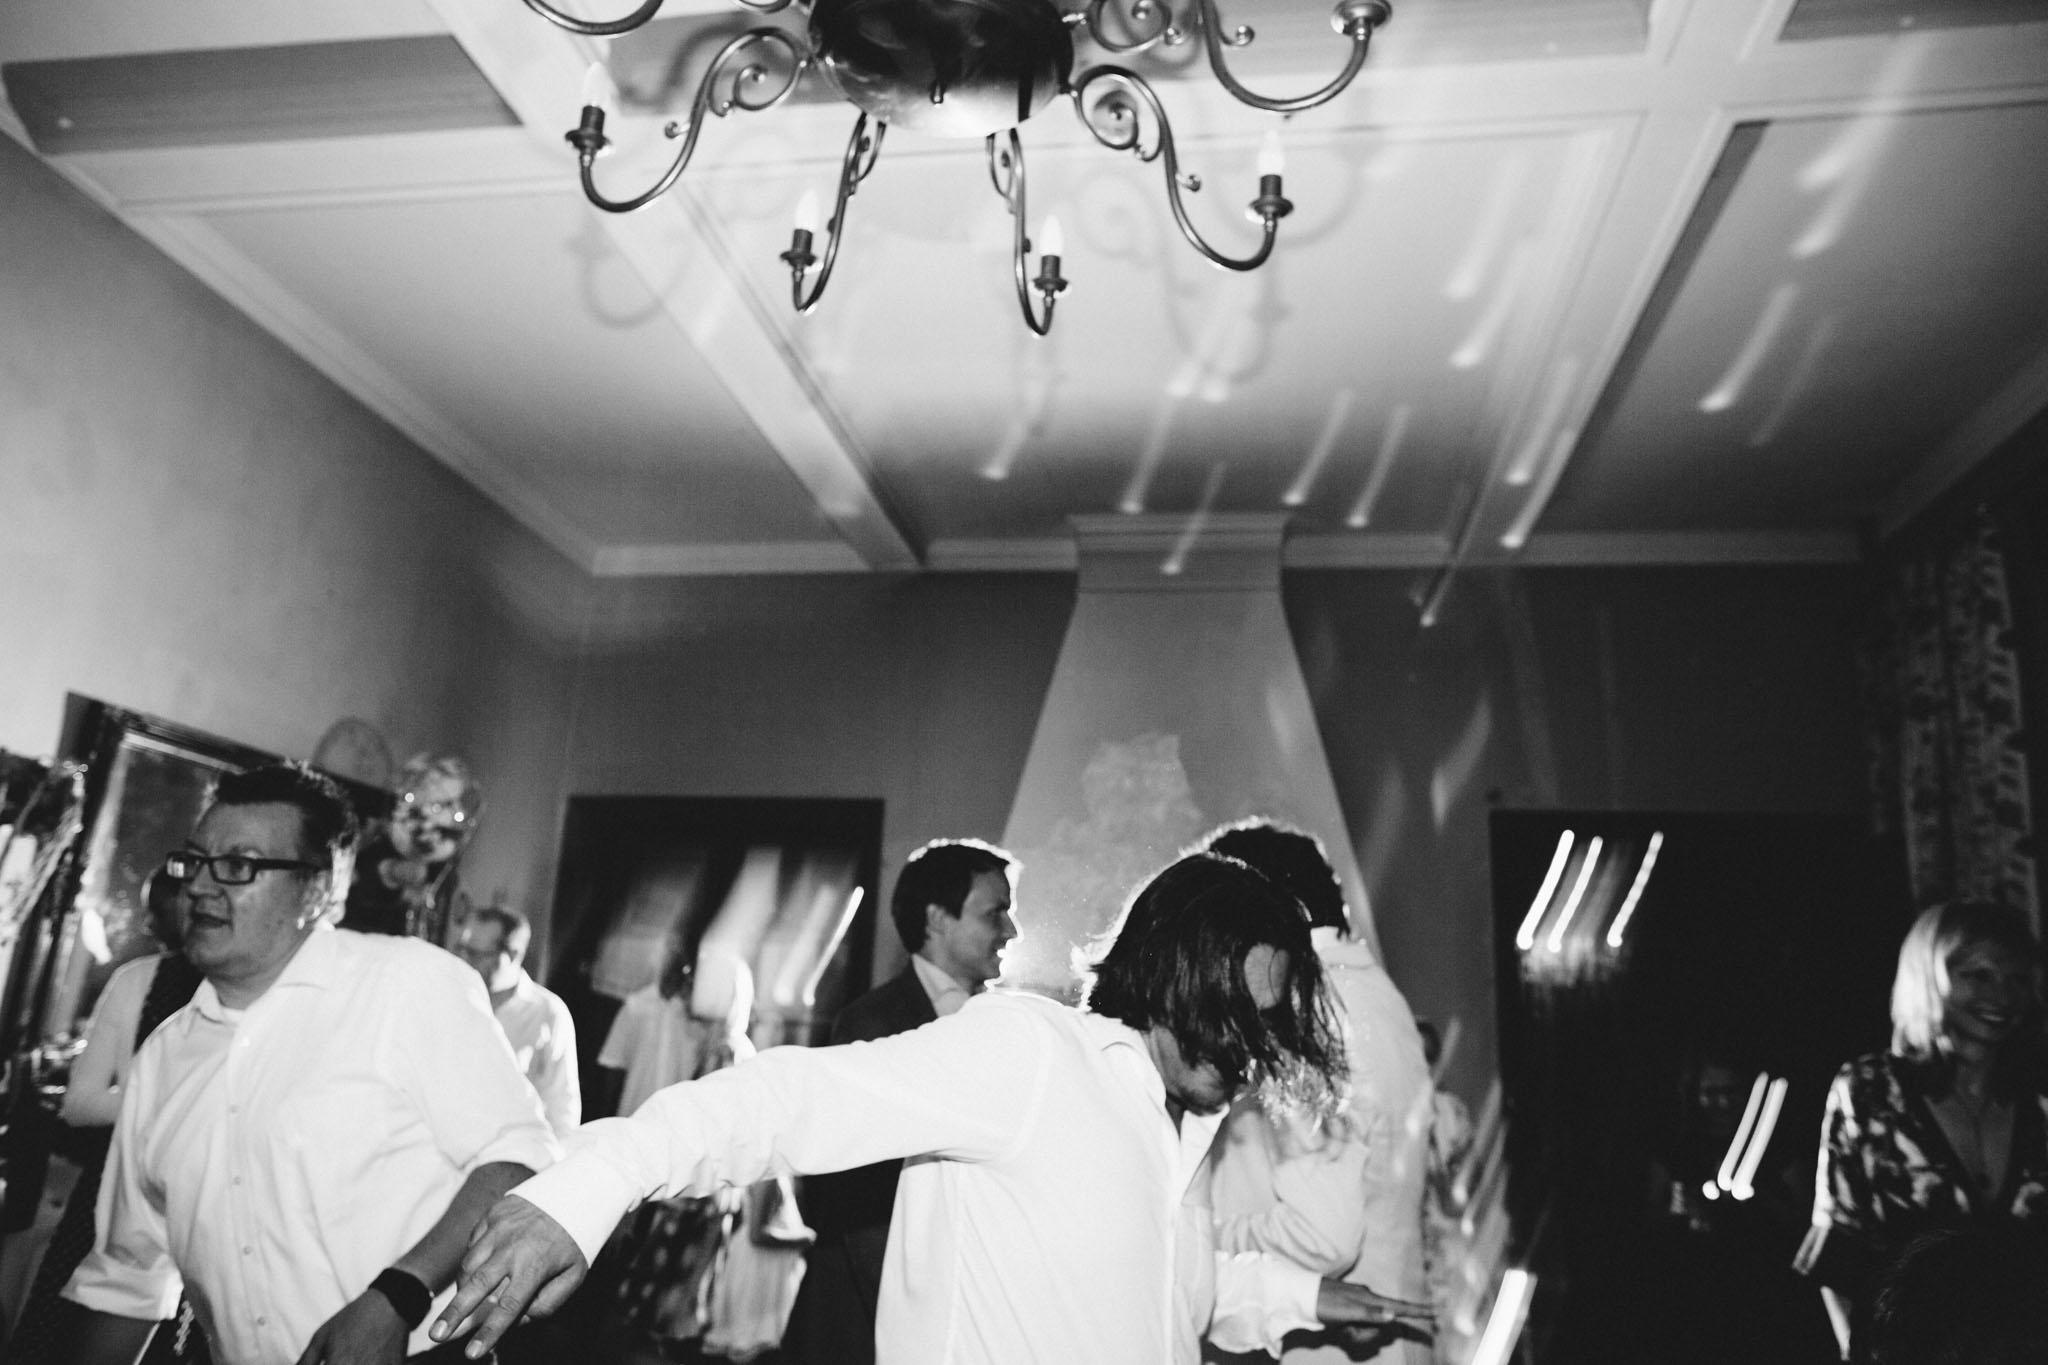 hochzeit-feier-tanz-fotos